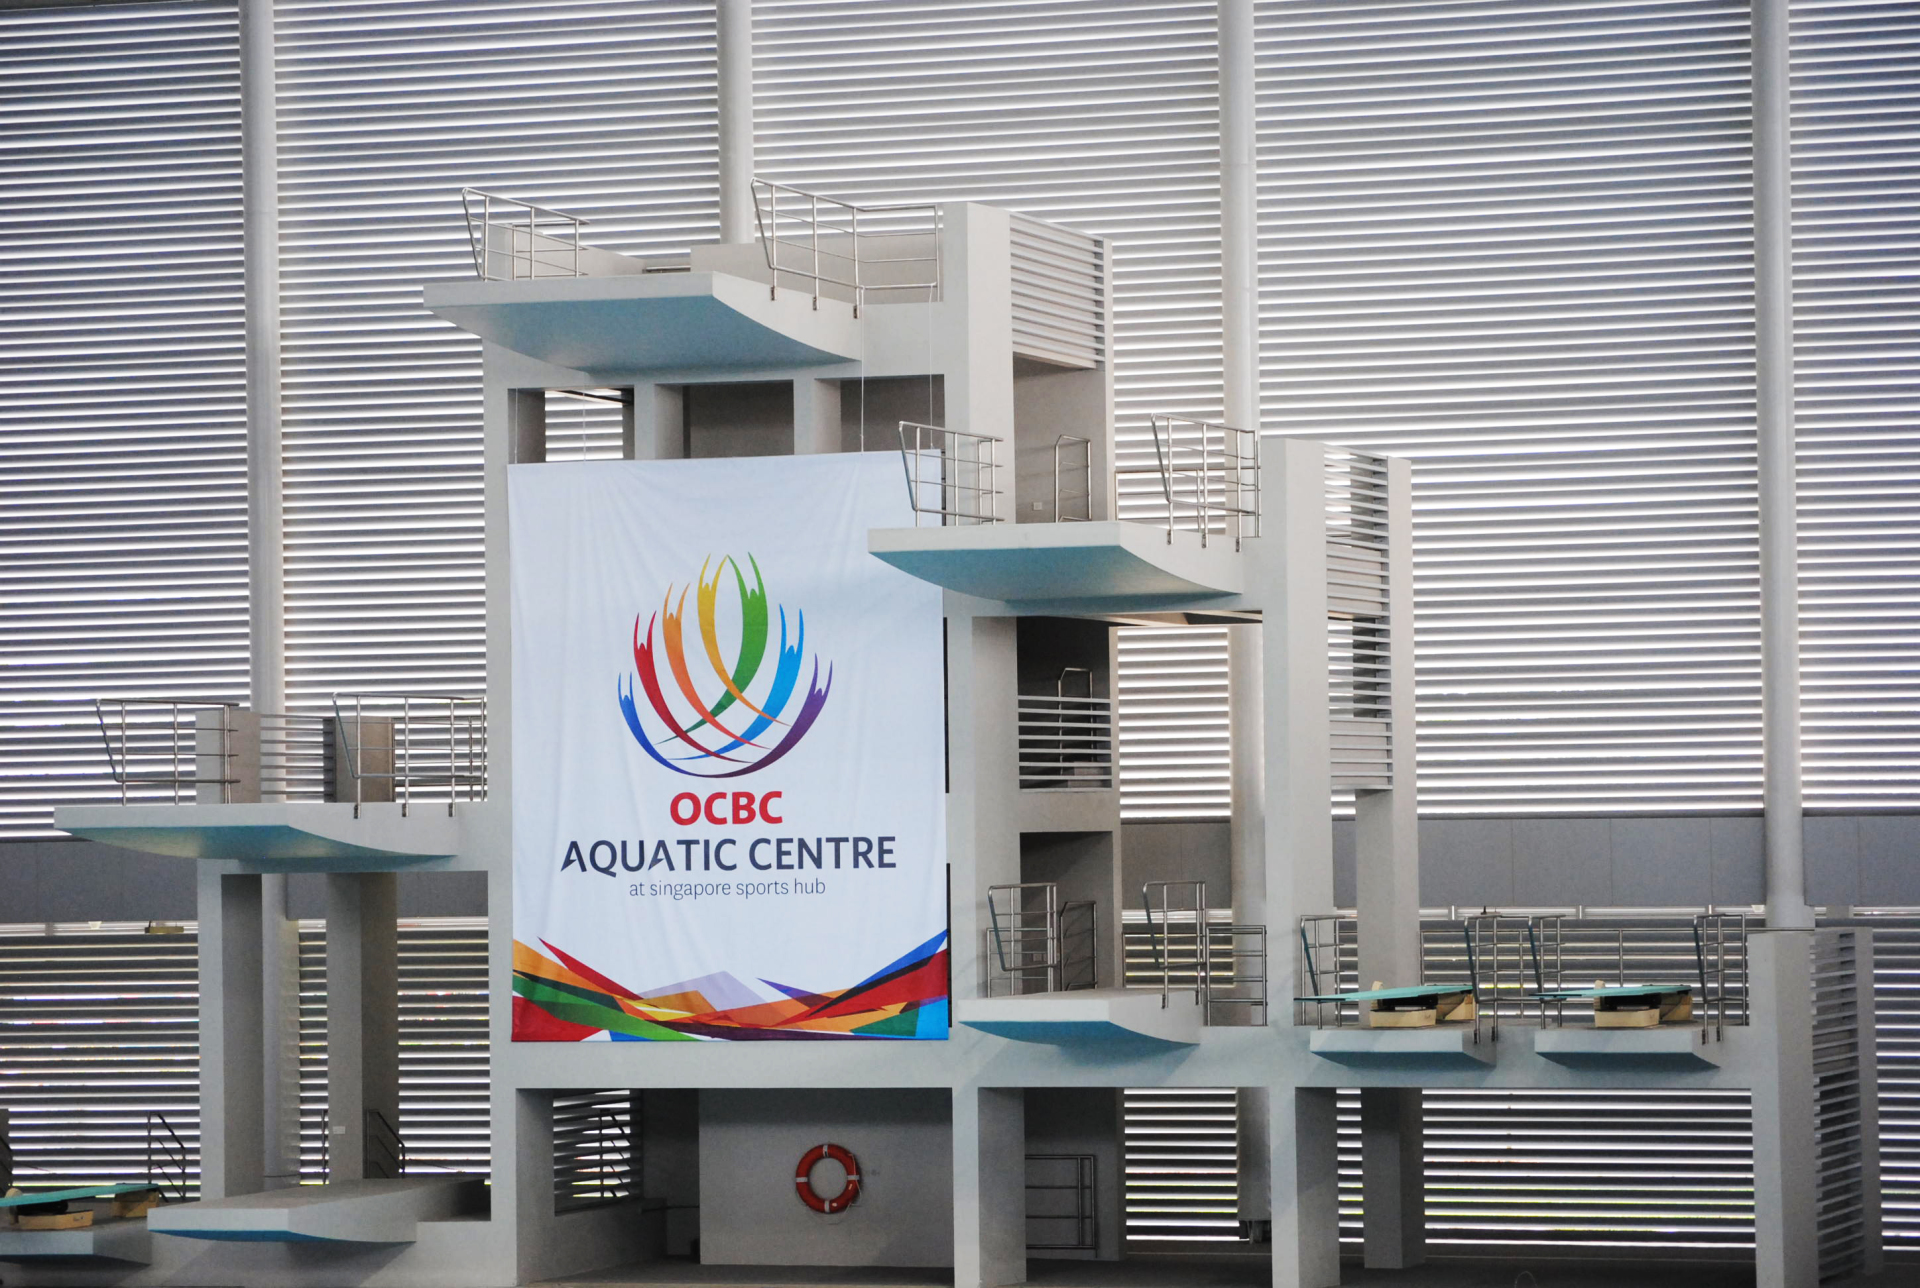 DIVING PLATFORM RAILINGS @ OCBC AQUATIC CENTRE